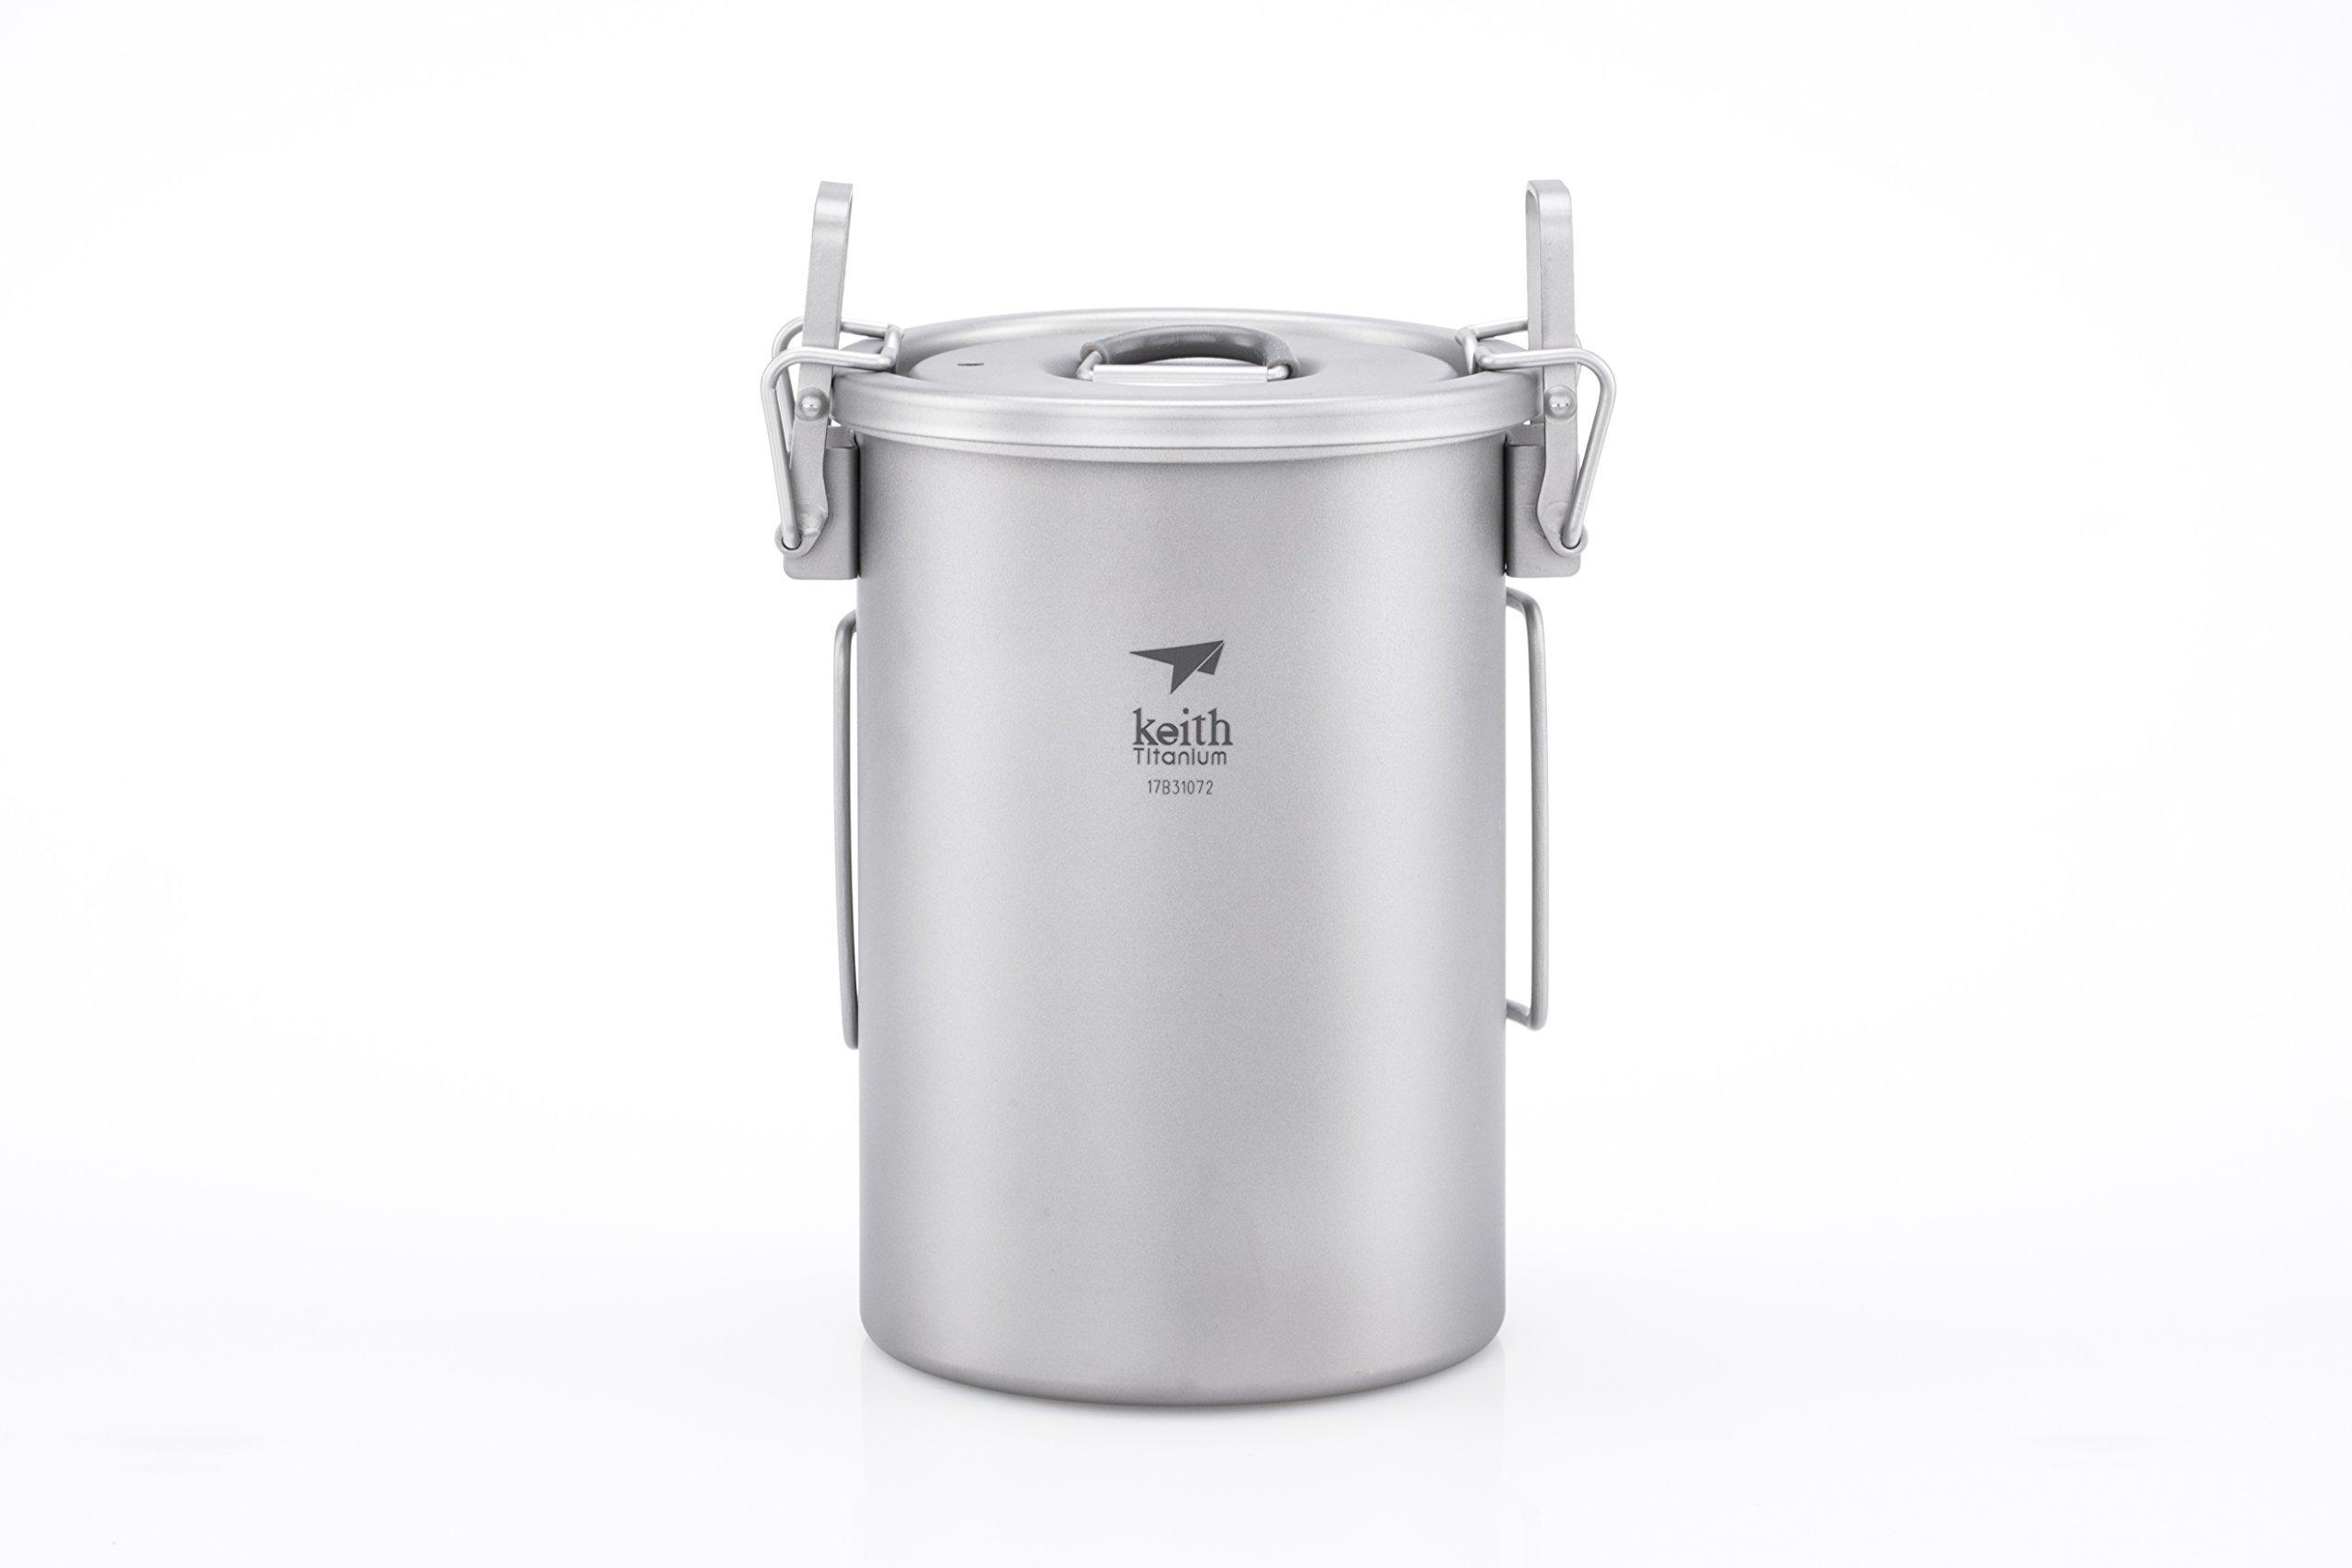 Keith Titanium Ti6300 Multifunctional Cooker